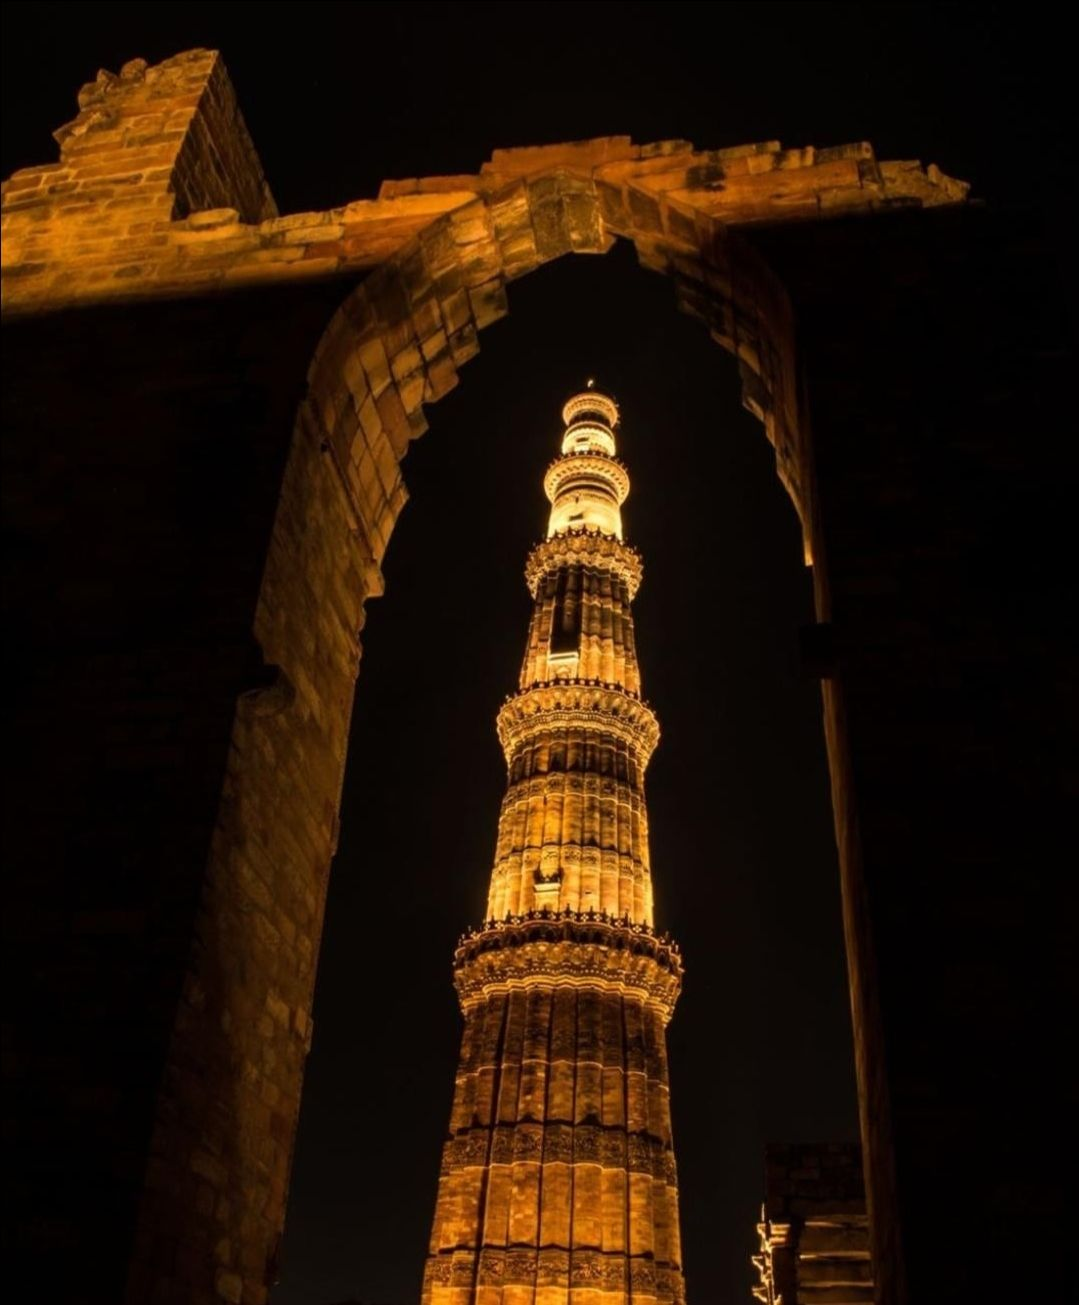 Photo of Qutub Minar By Manish Pandey